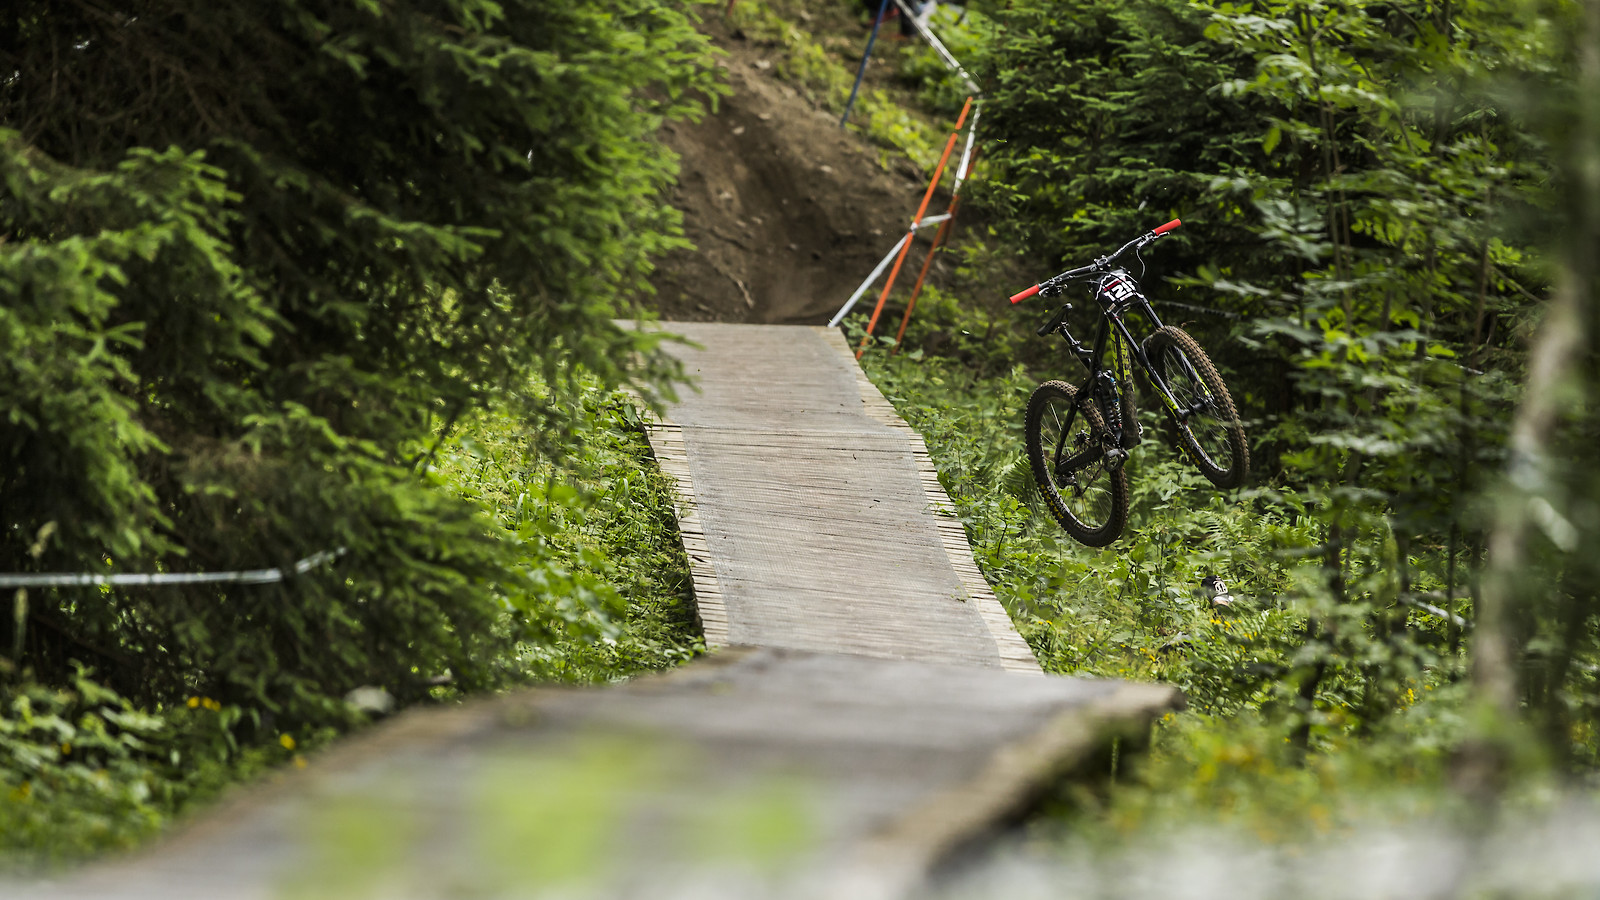 10 - phunkt.com - Mountain Biking Pictures - Vital MTB